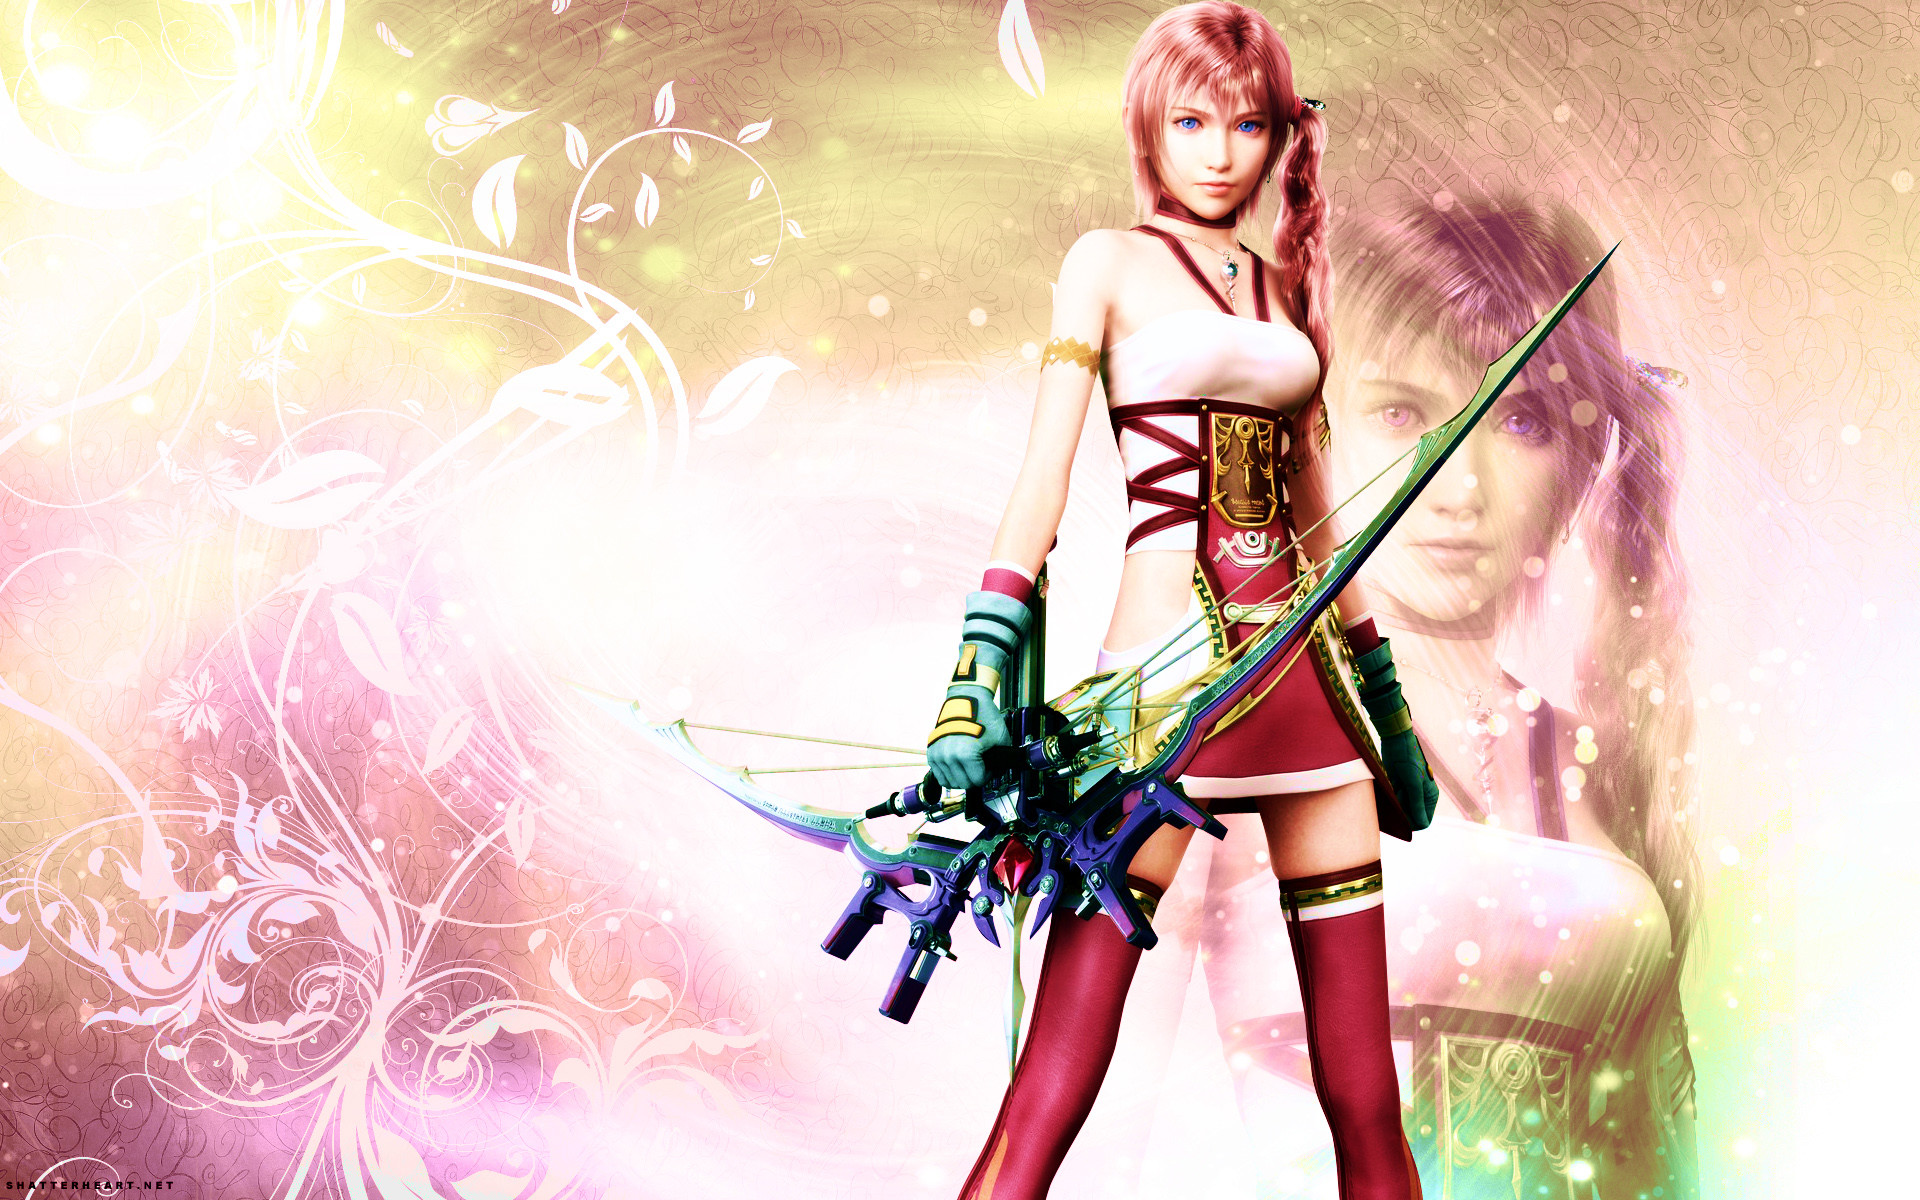 Final Fantasy 13 2 Wallpaper (79+ images)